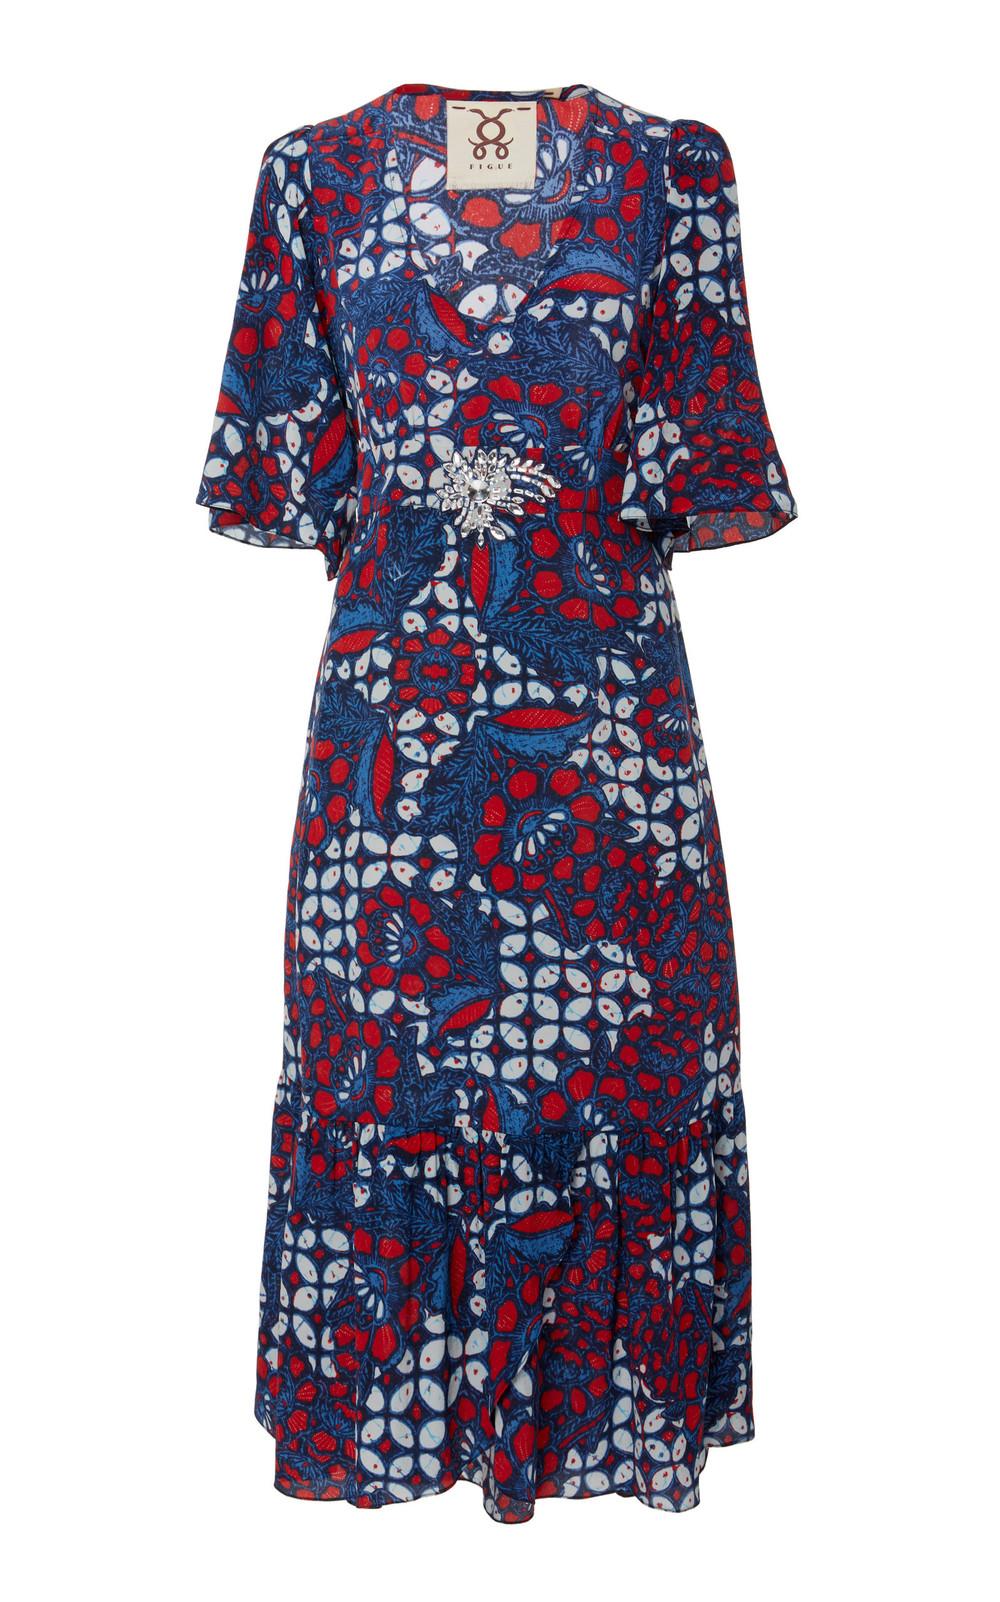 Figue Nadine Belted Printed Silk-Crepe Midi Dress in multi